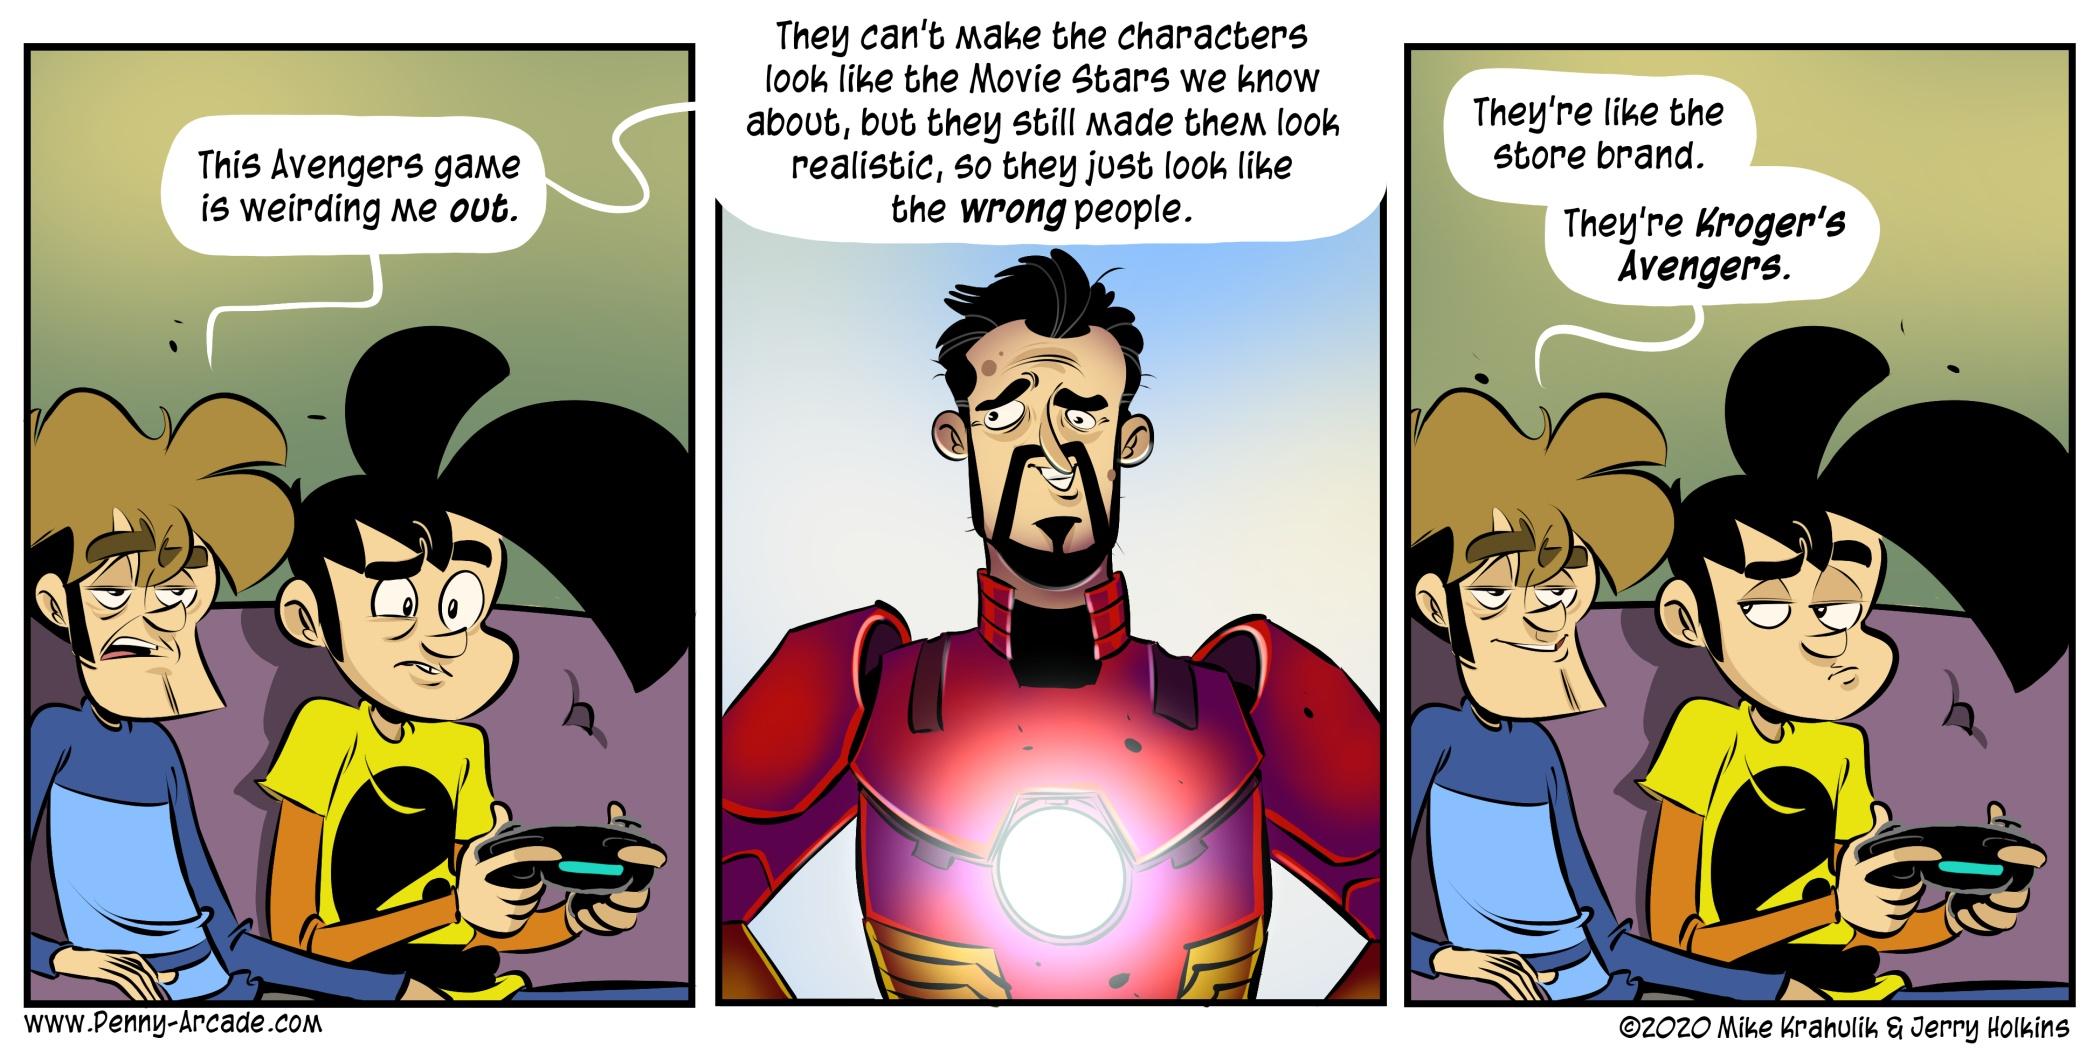 Avengers Resemble